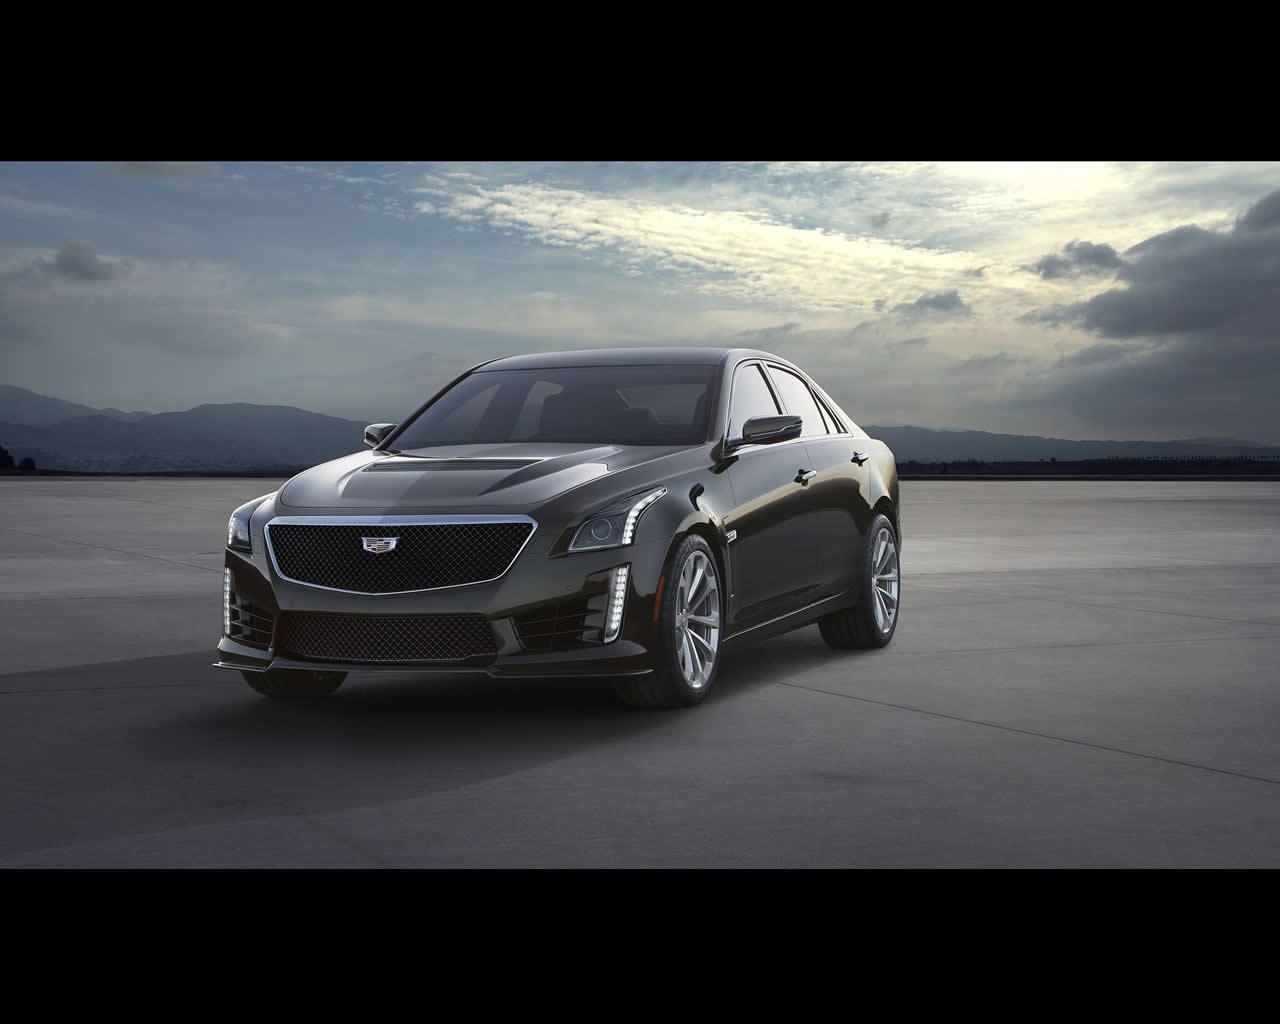 640 Hp Cadillac >> Cadillac 640 hp 200 mph CTS-V 2016